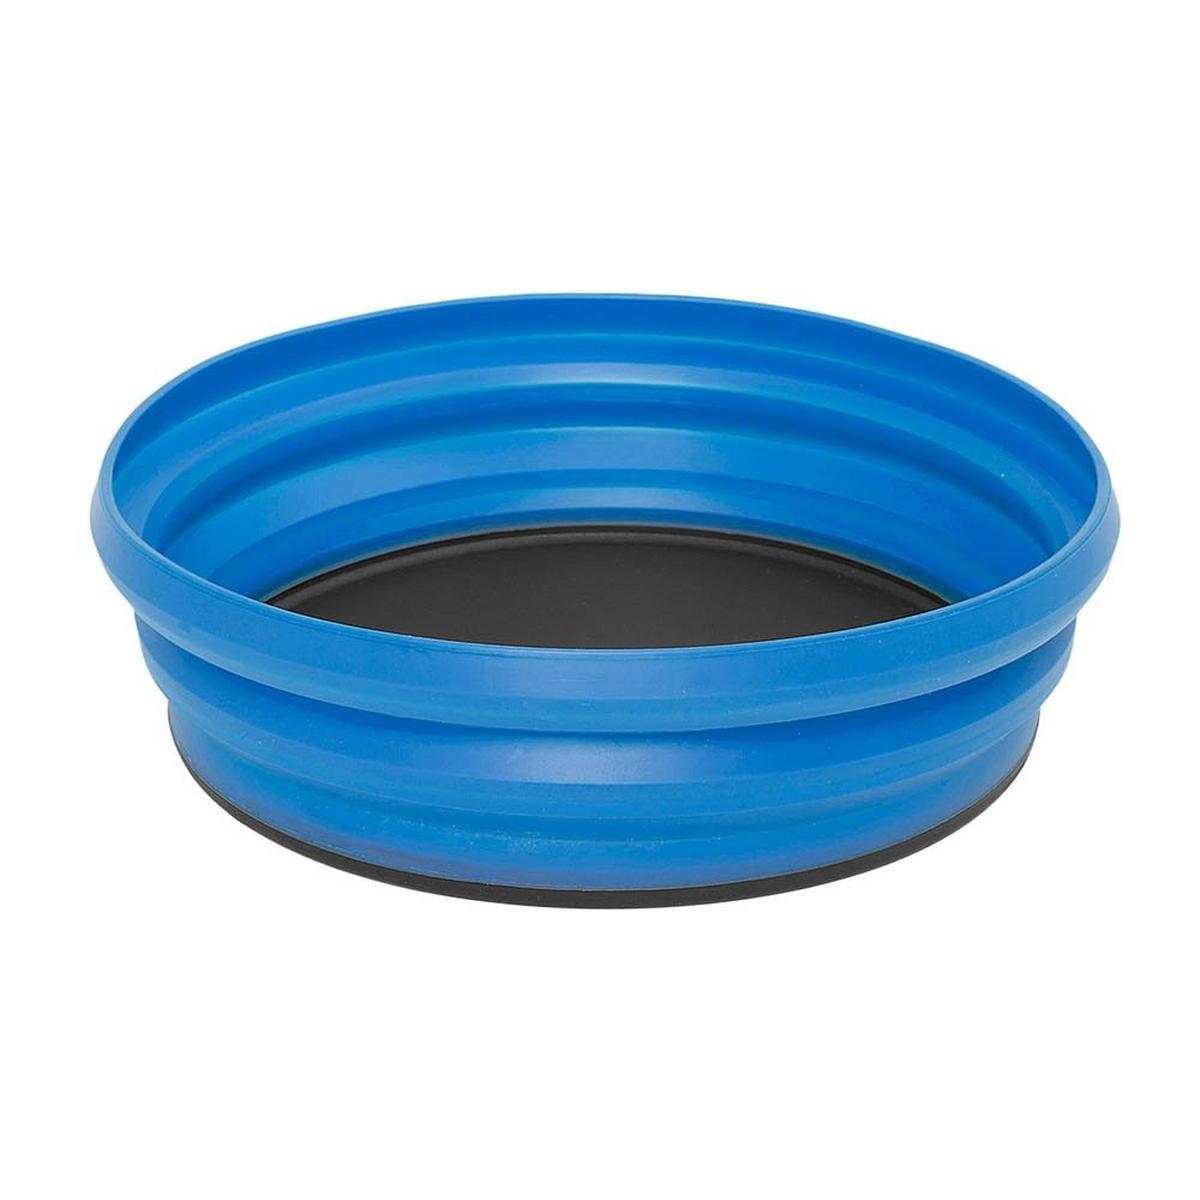 Sea To Summit X-Bowl Blue